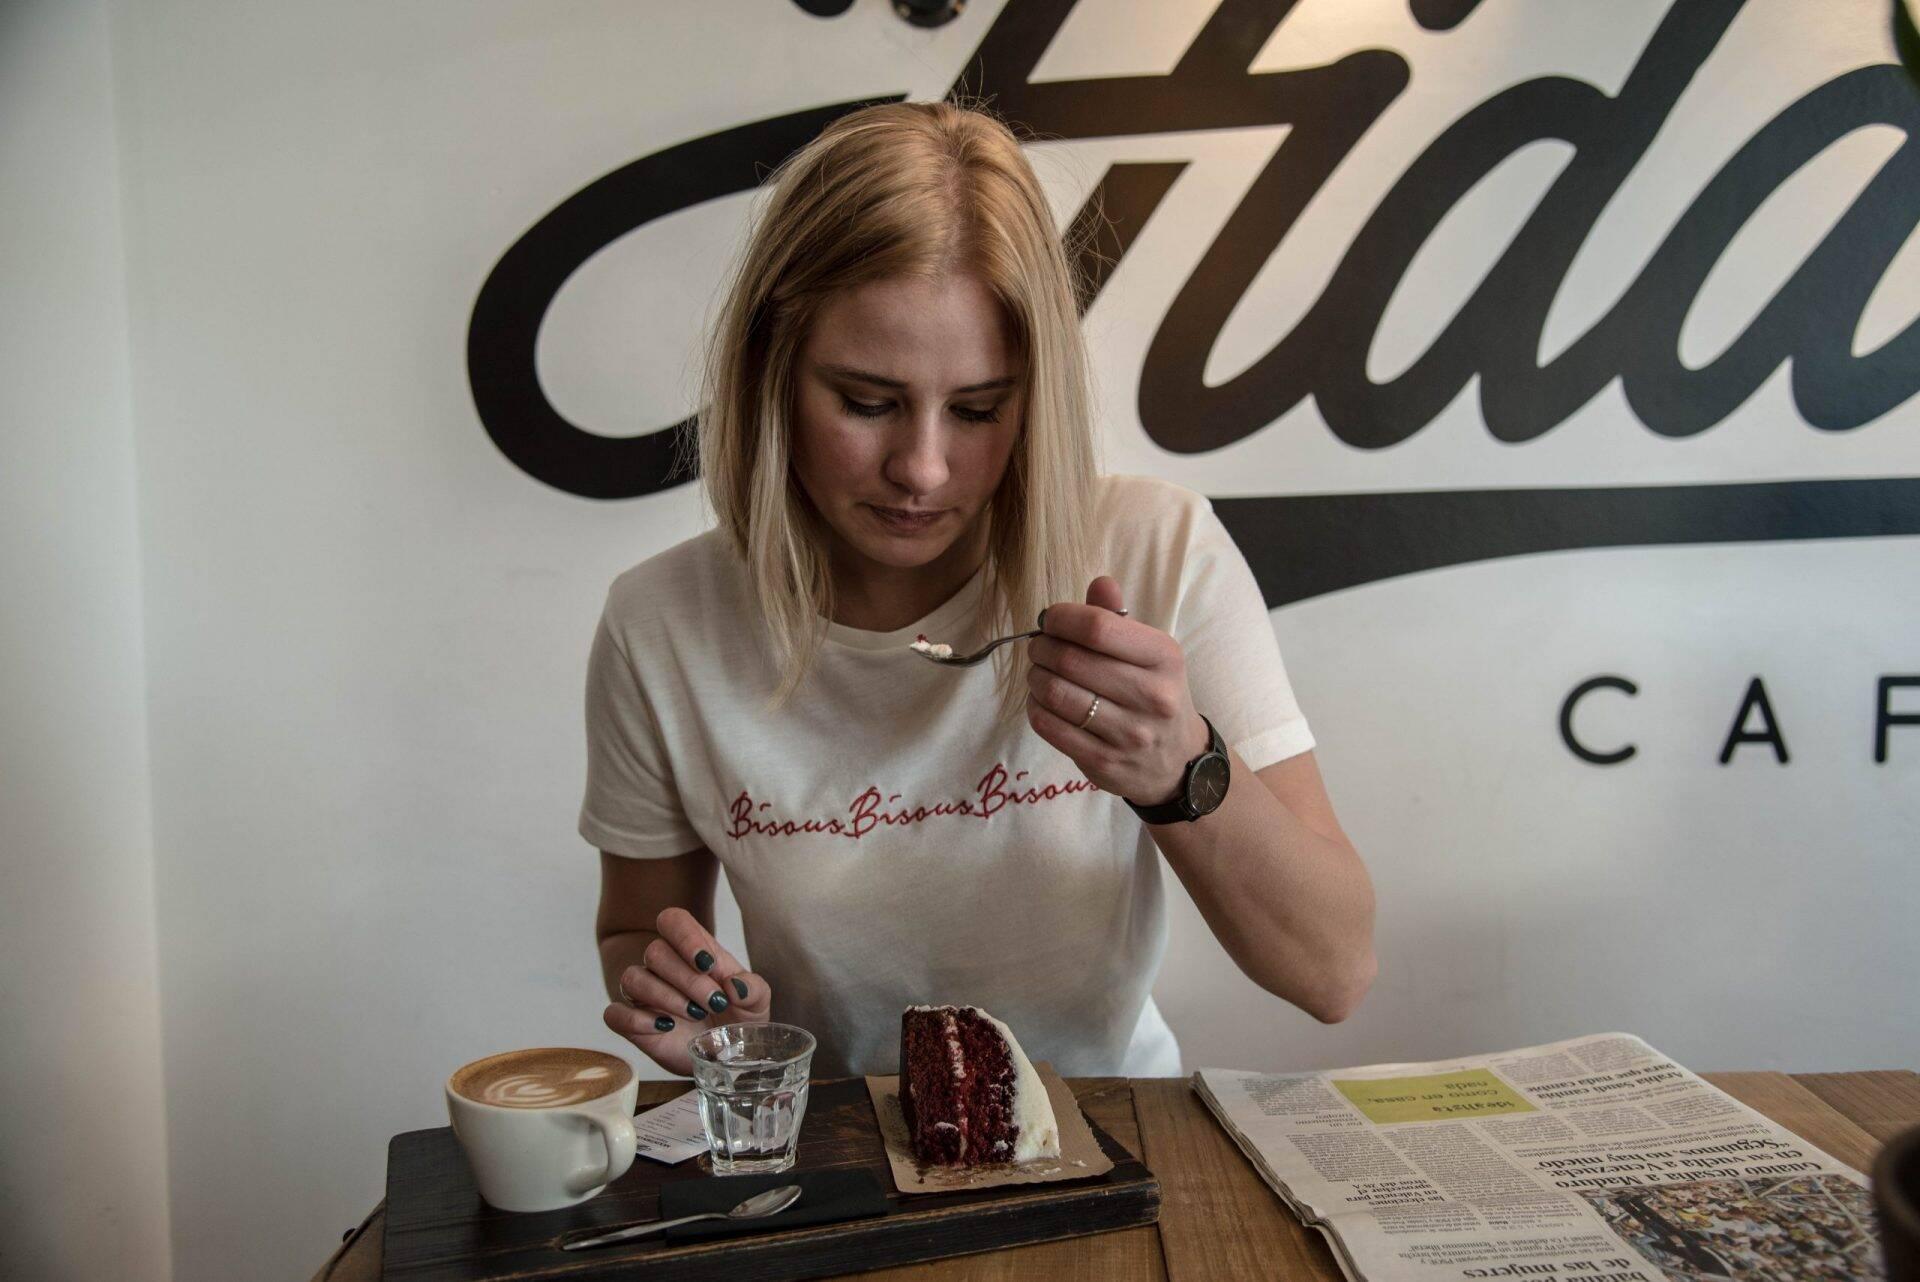 Hidden Cafe Barcelona in Barcelona